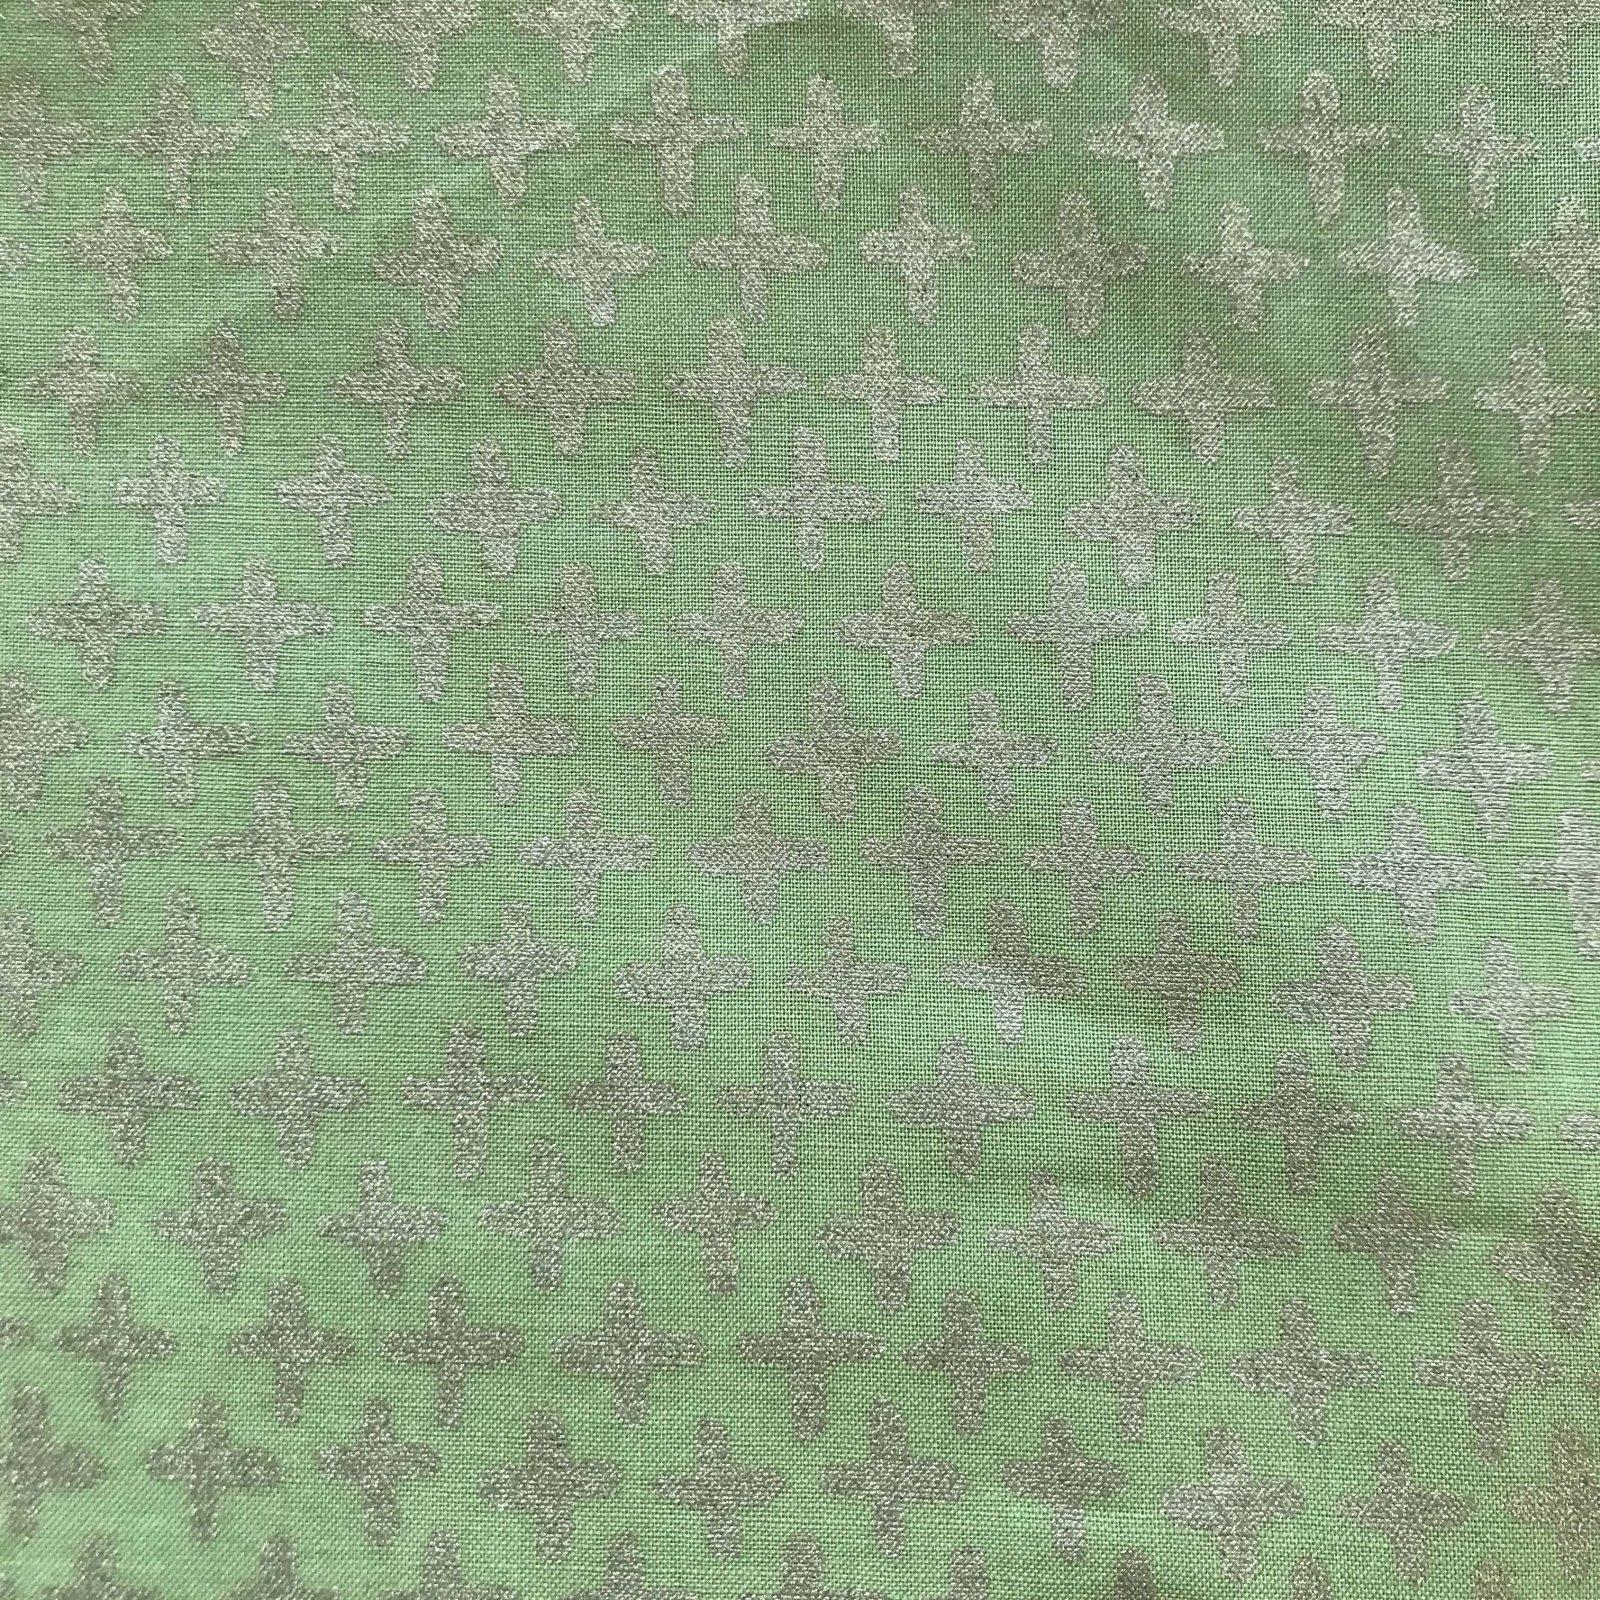 Remnant - Monaluna Organic Green Shimmer Poplin - 3yd